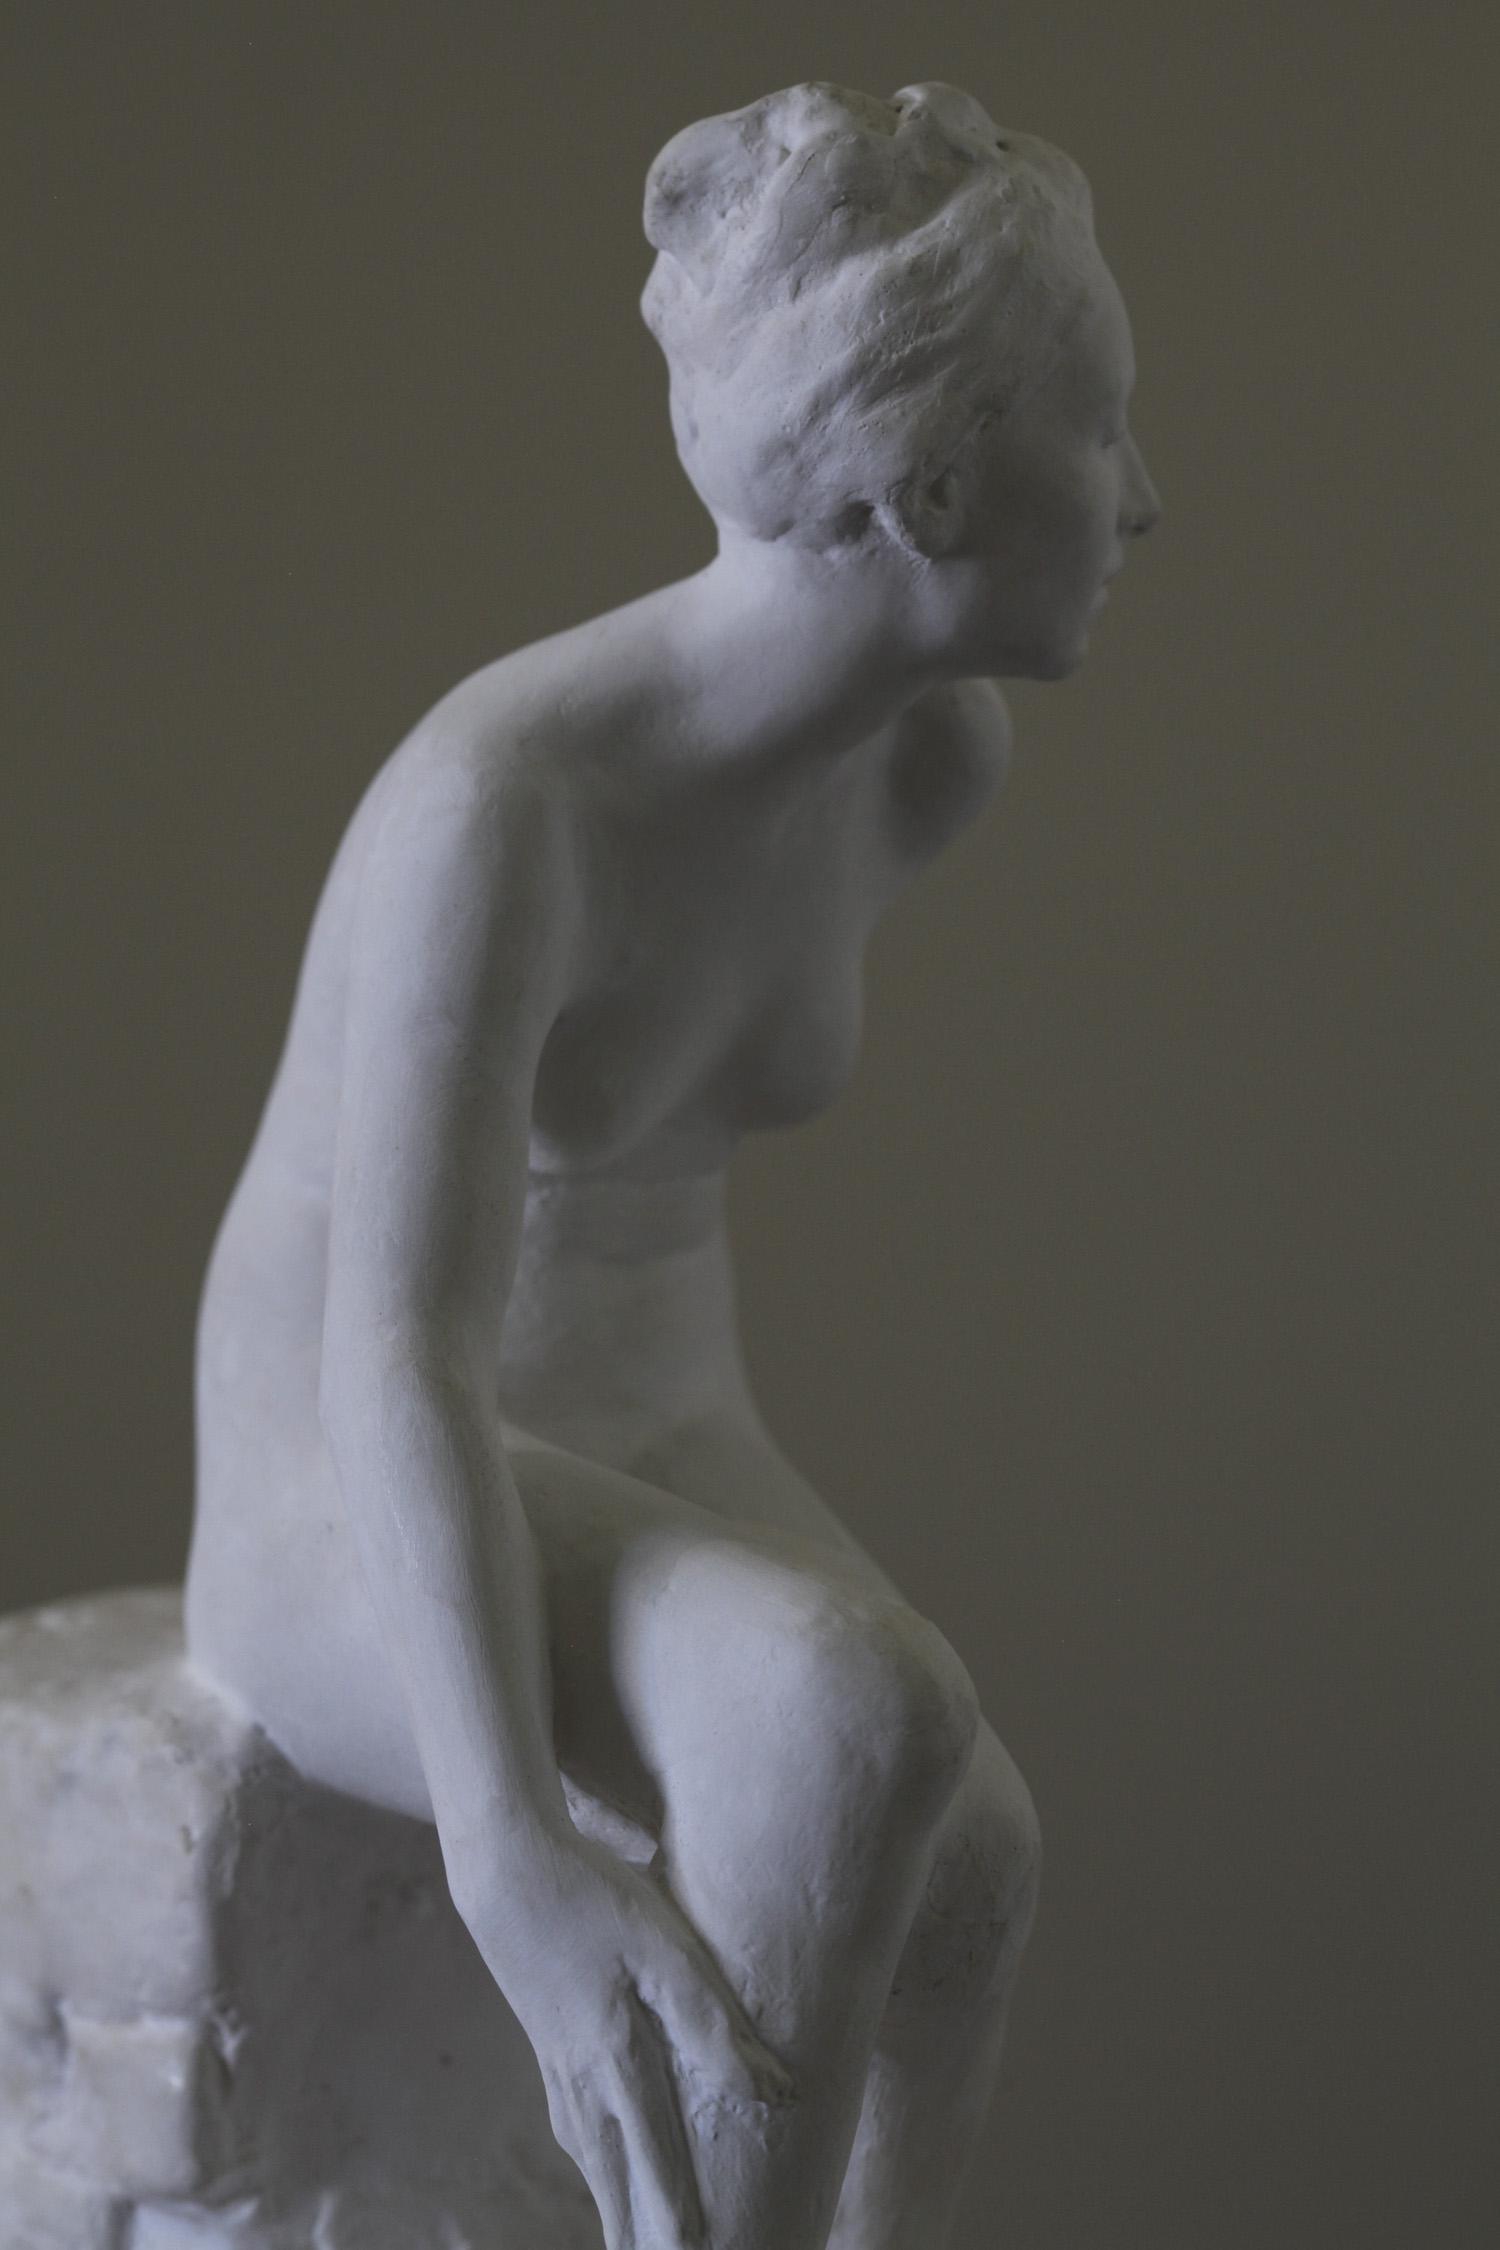 Small figure study, ~1/6, plaster